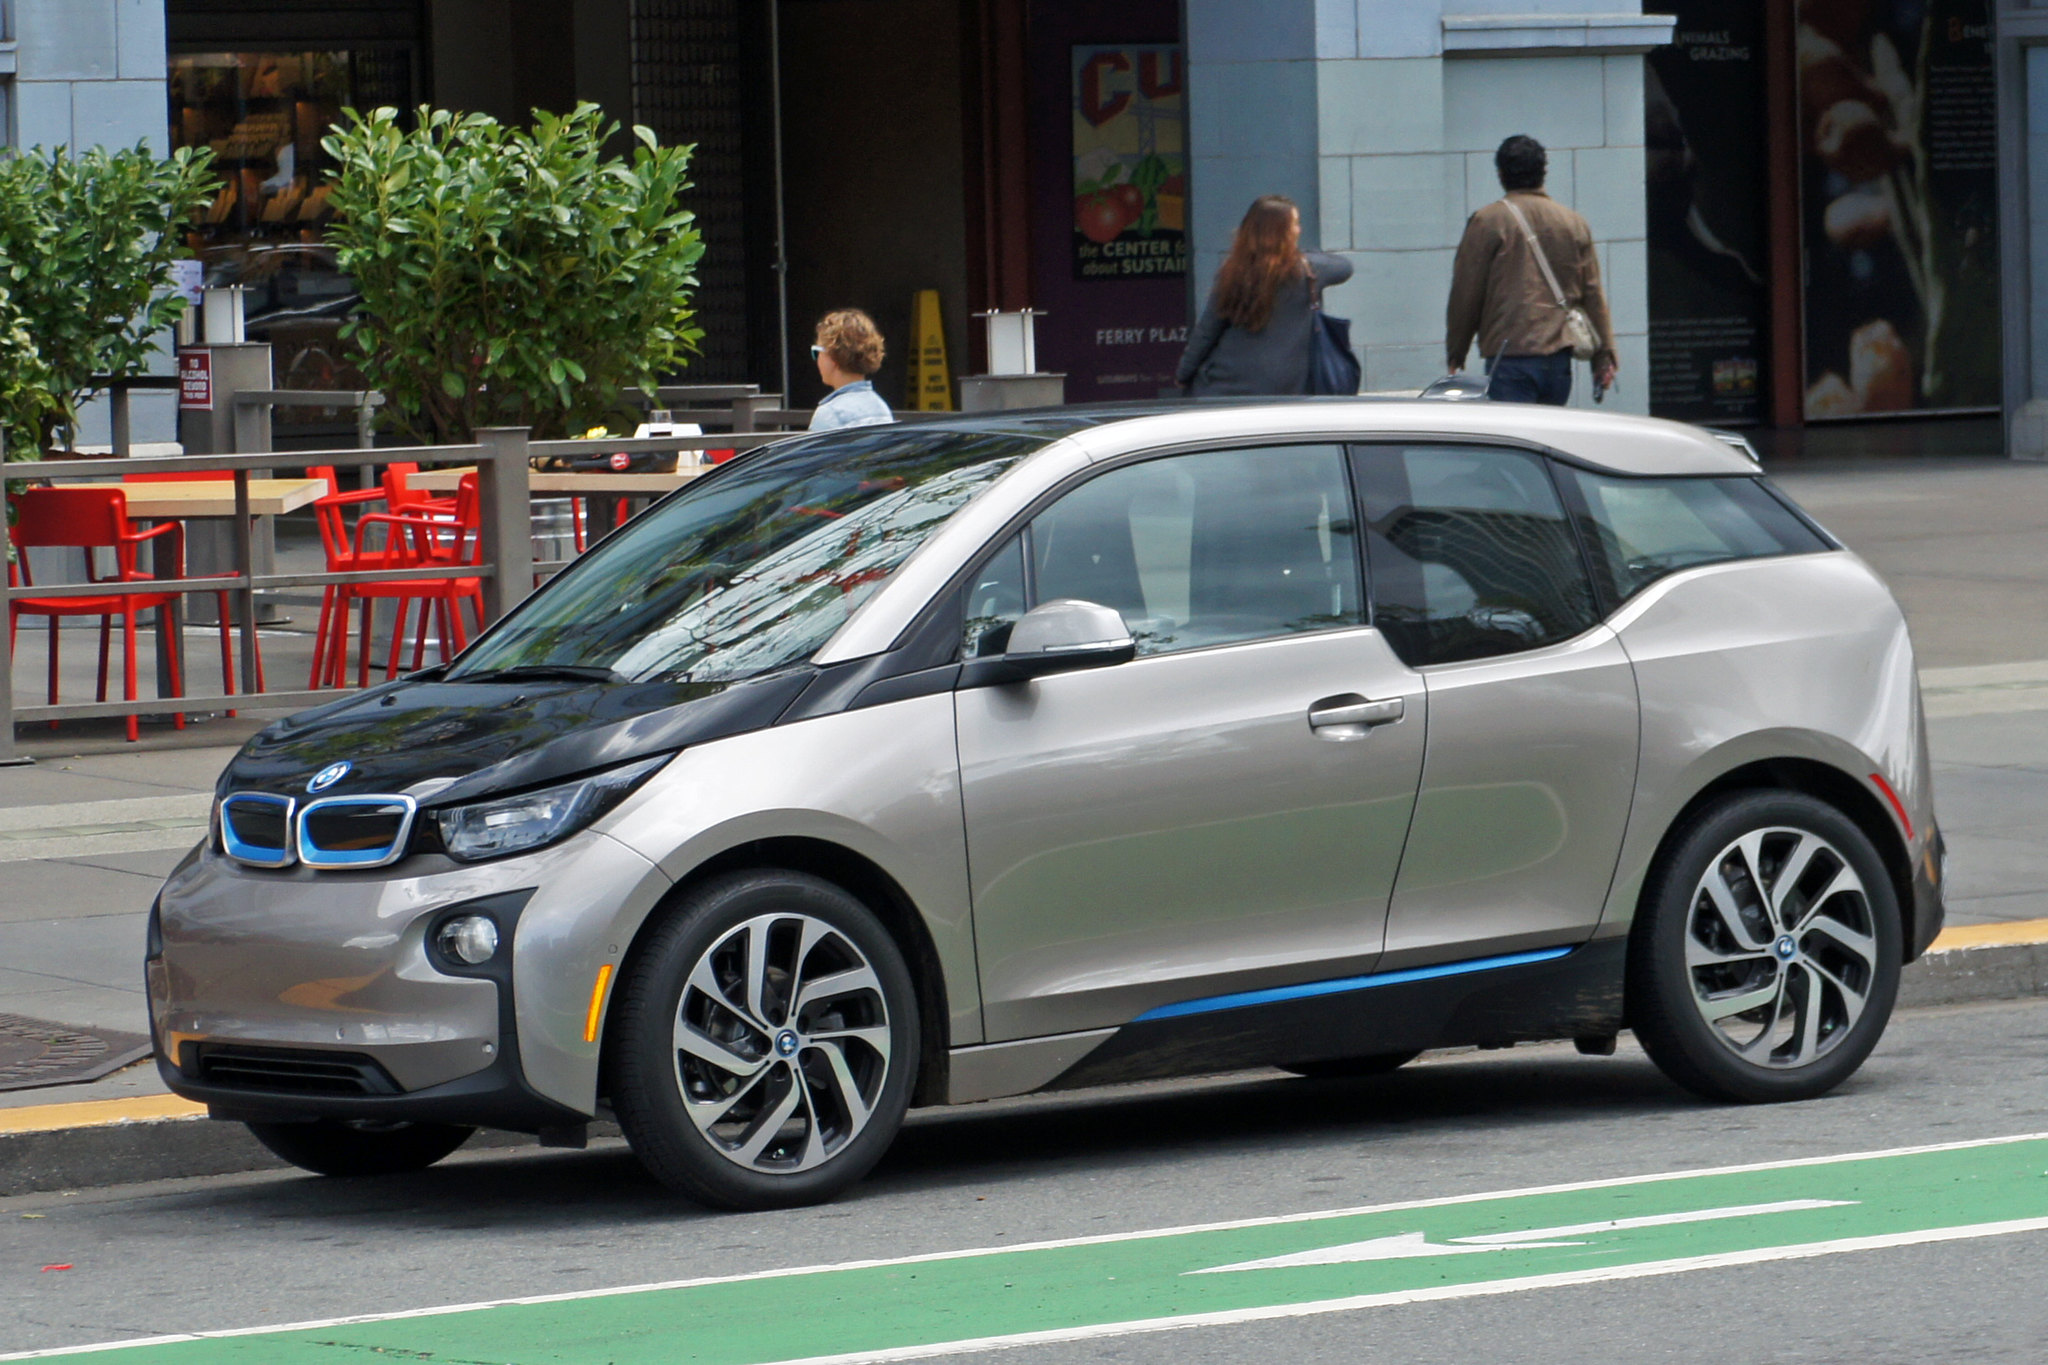 Electric Car Rental San Francisco